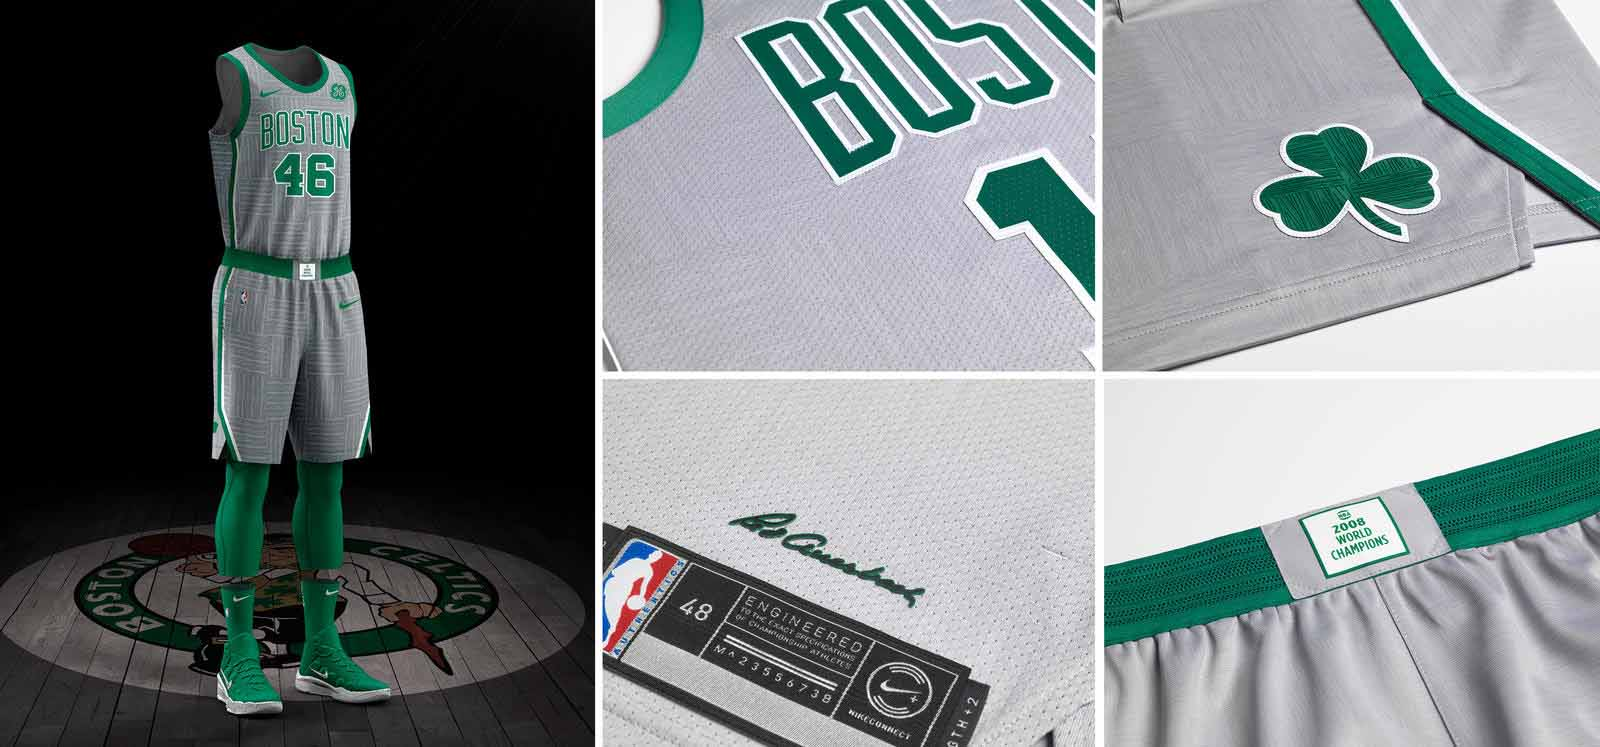 Nike_NBA_City_Edition_Uniform_Boston_Celtics_Group_native_1600